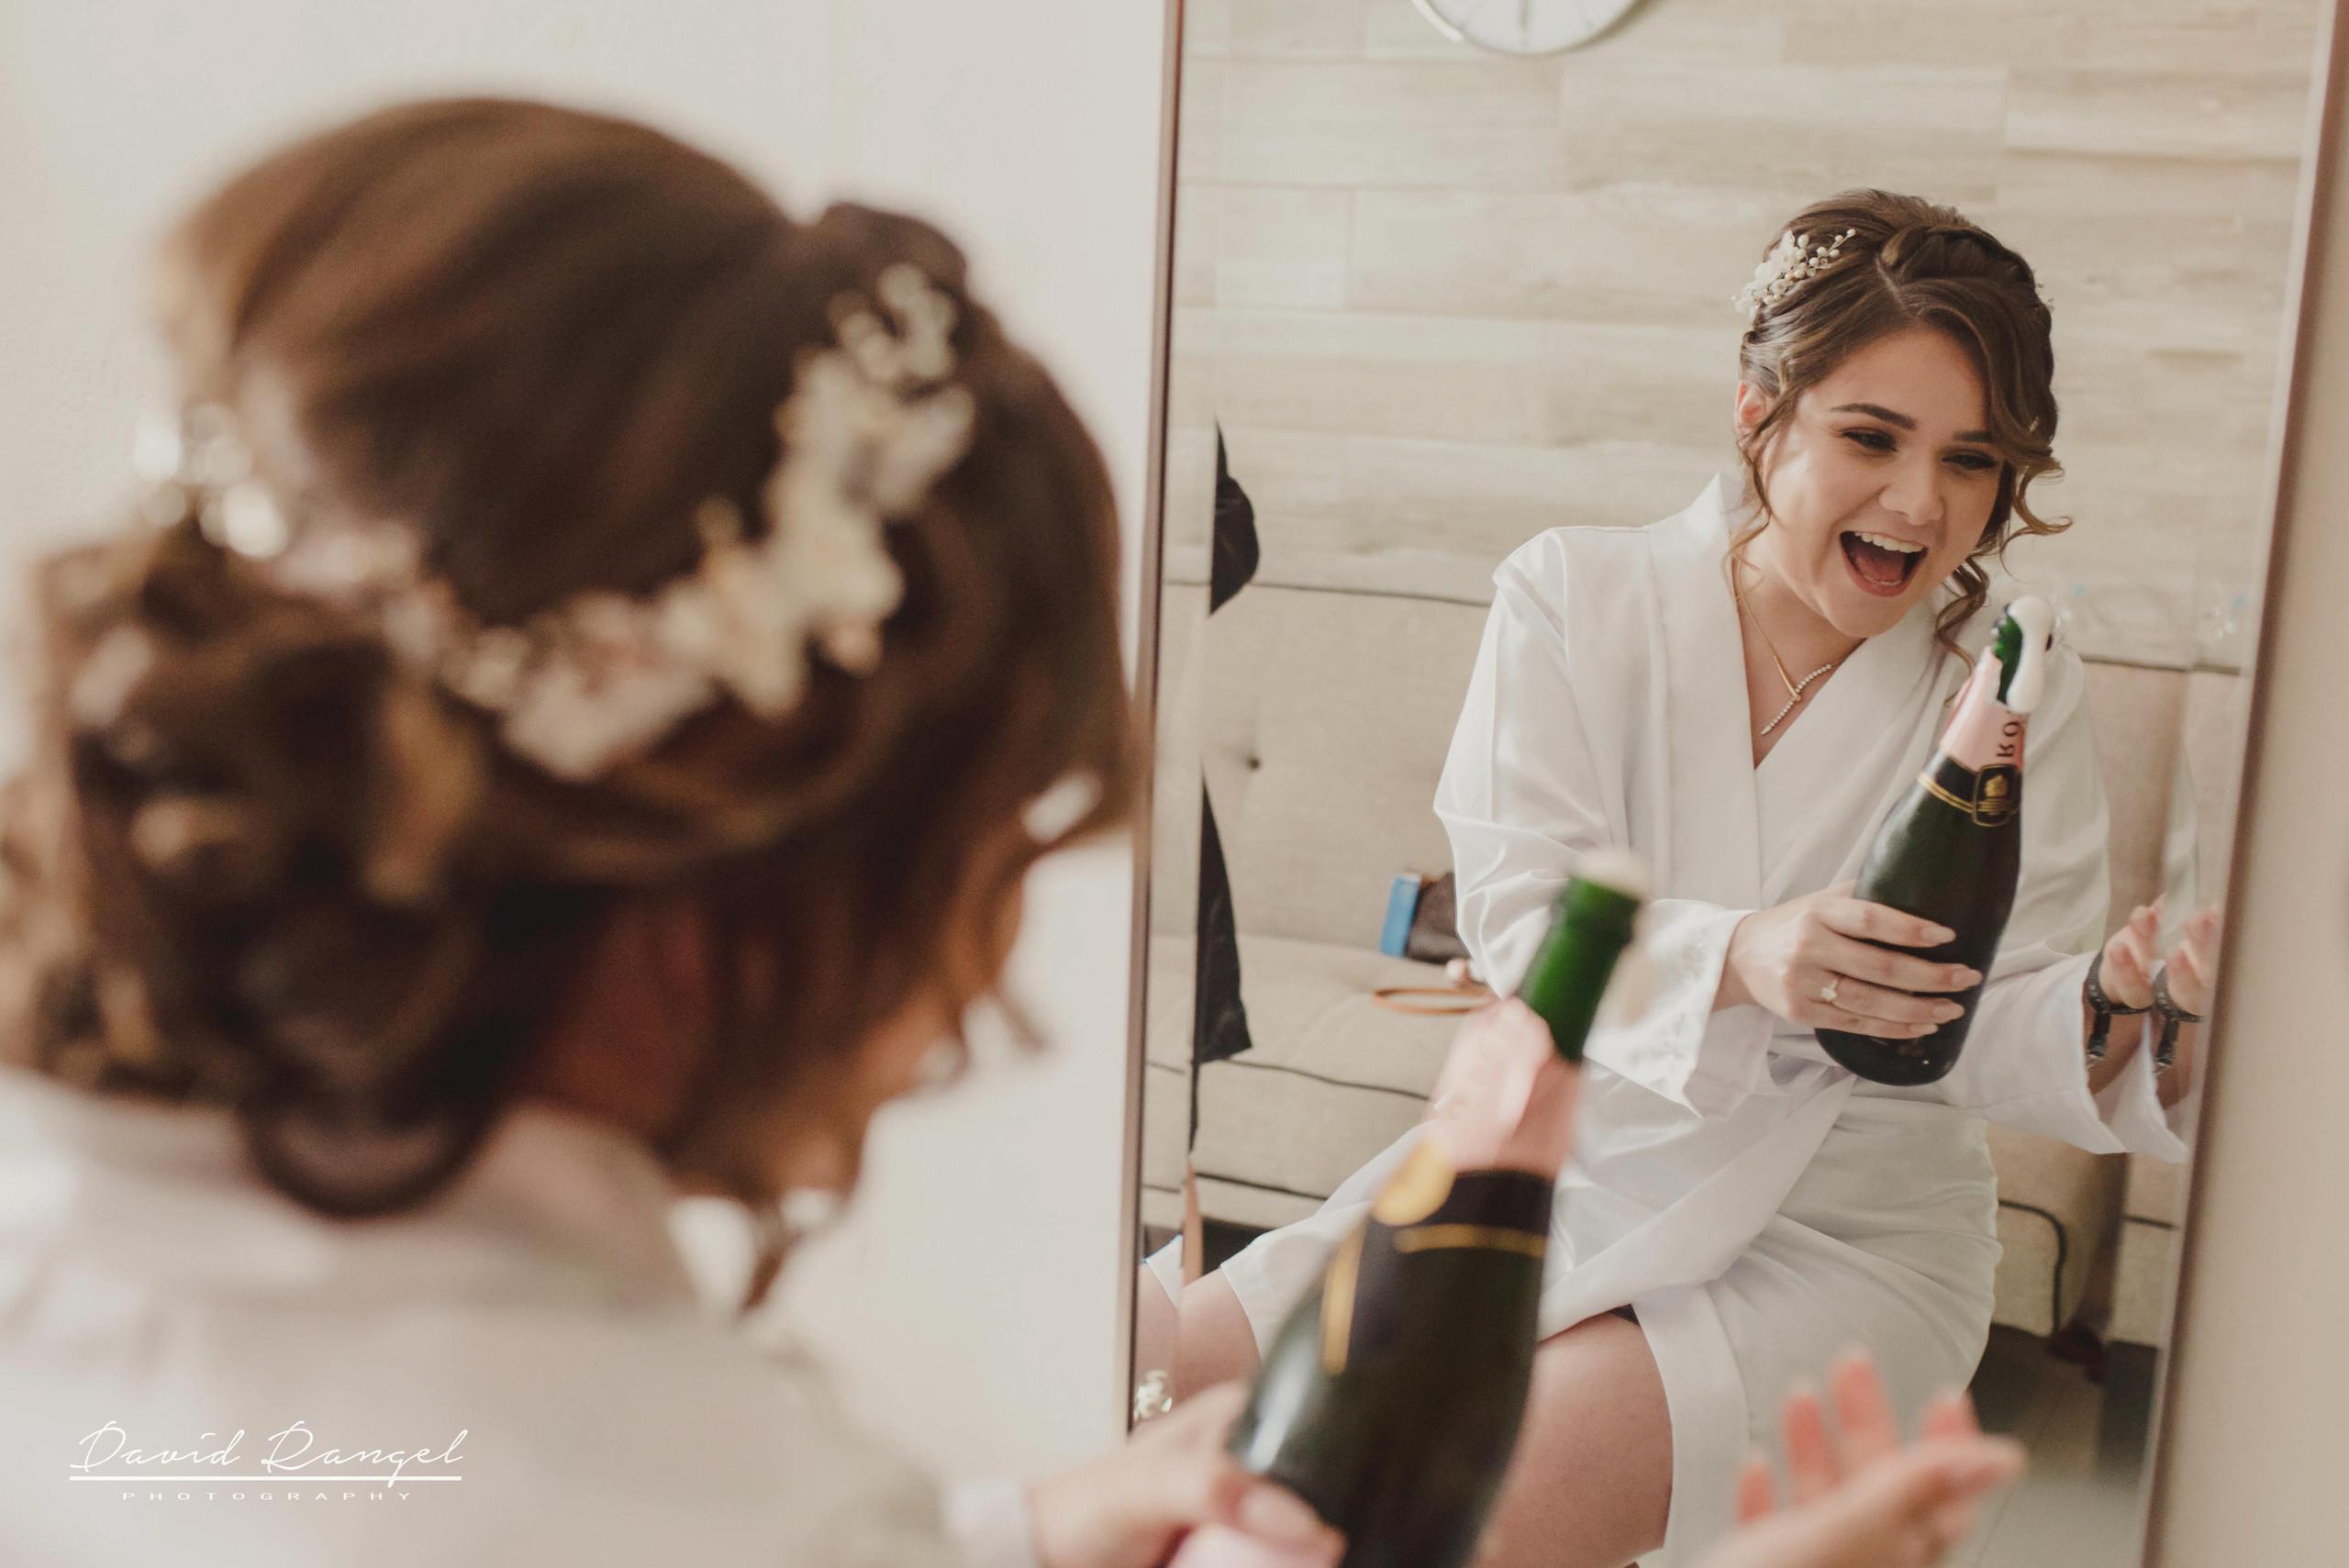 bride+getting+ready+shadow+earring++bathrobe+natural+ligh+photo+destination+wedding+isla+blanca+smile+champagne+mirror+photo+celebration+drink+alcohol